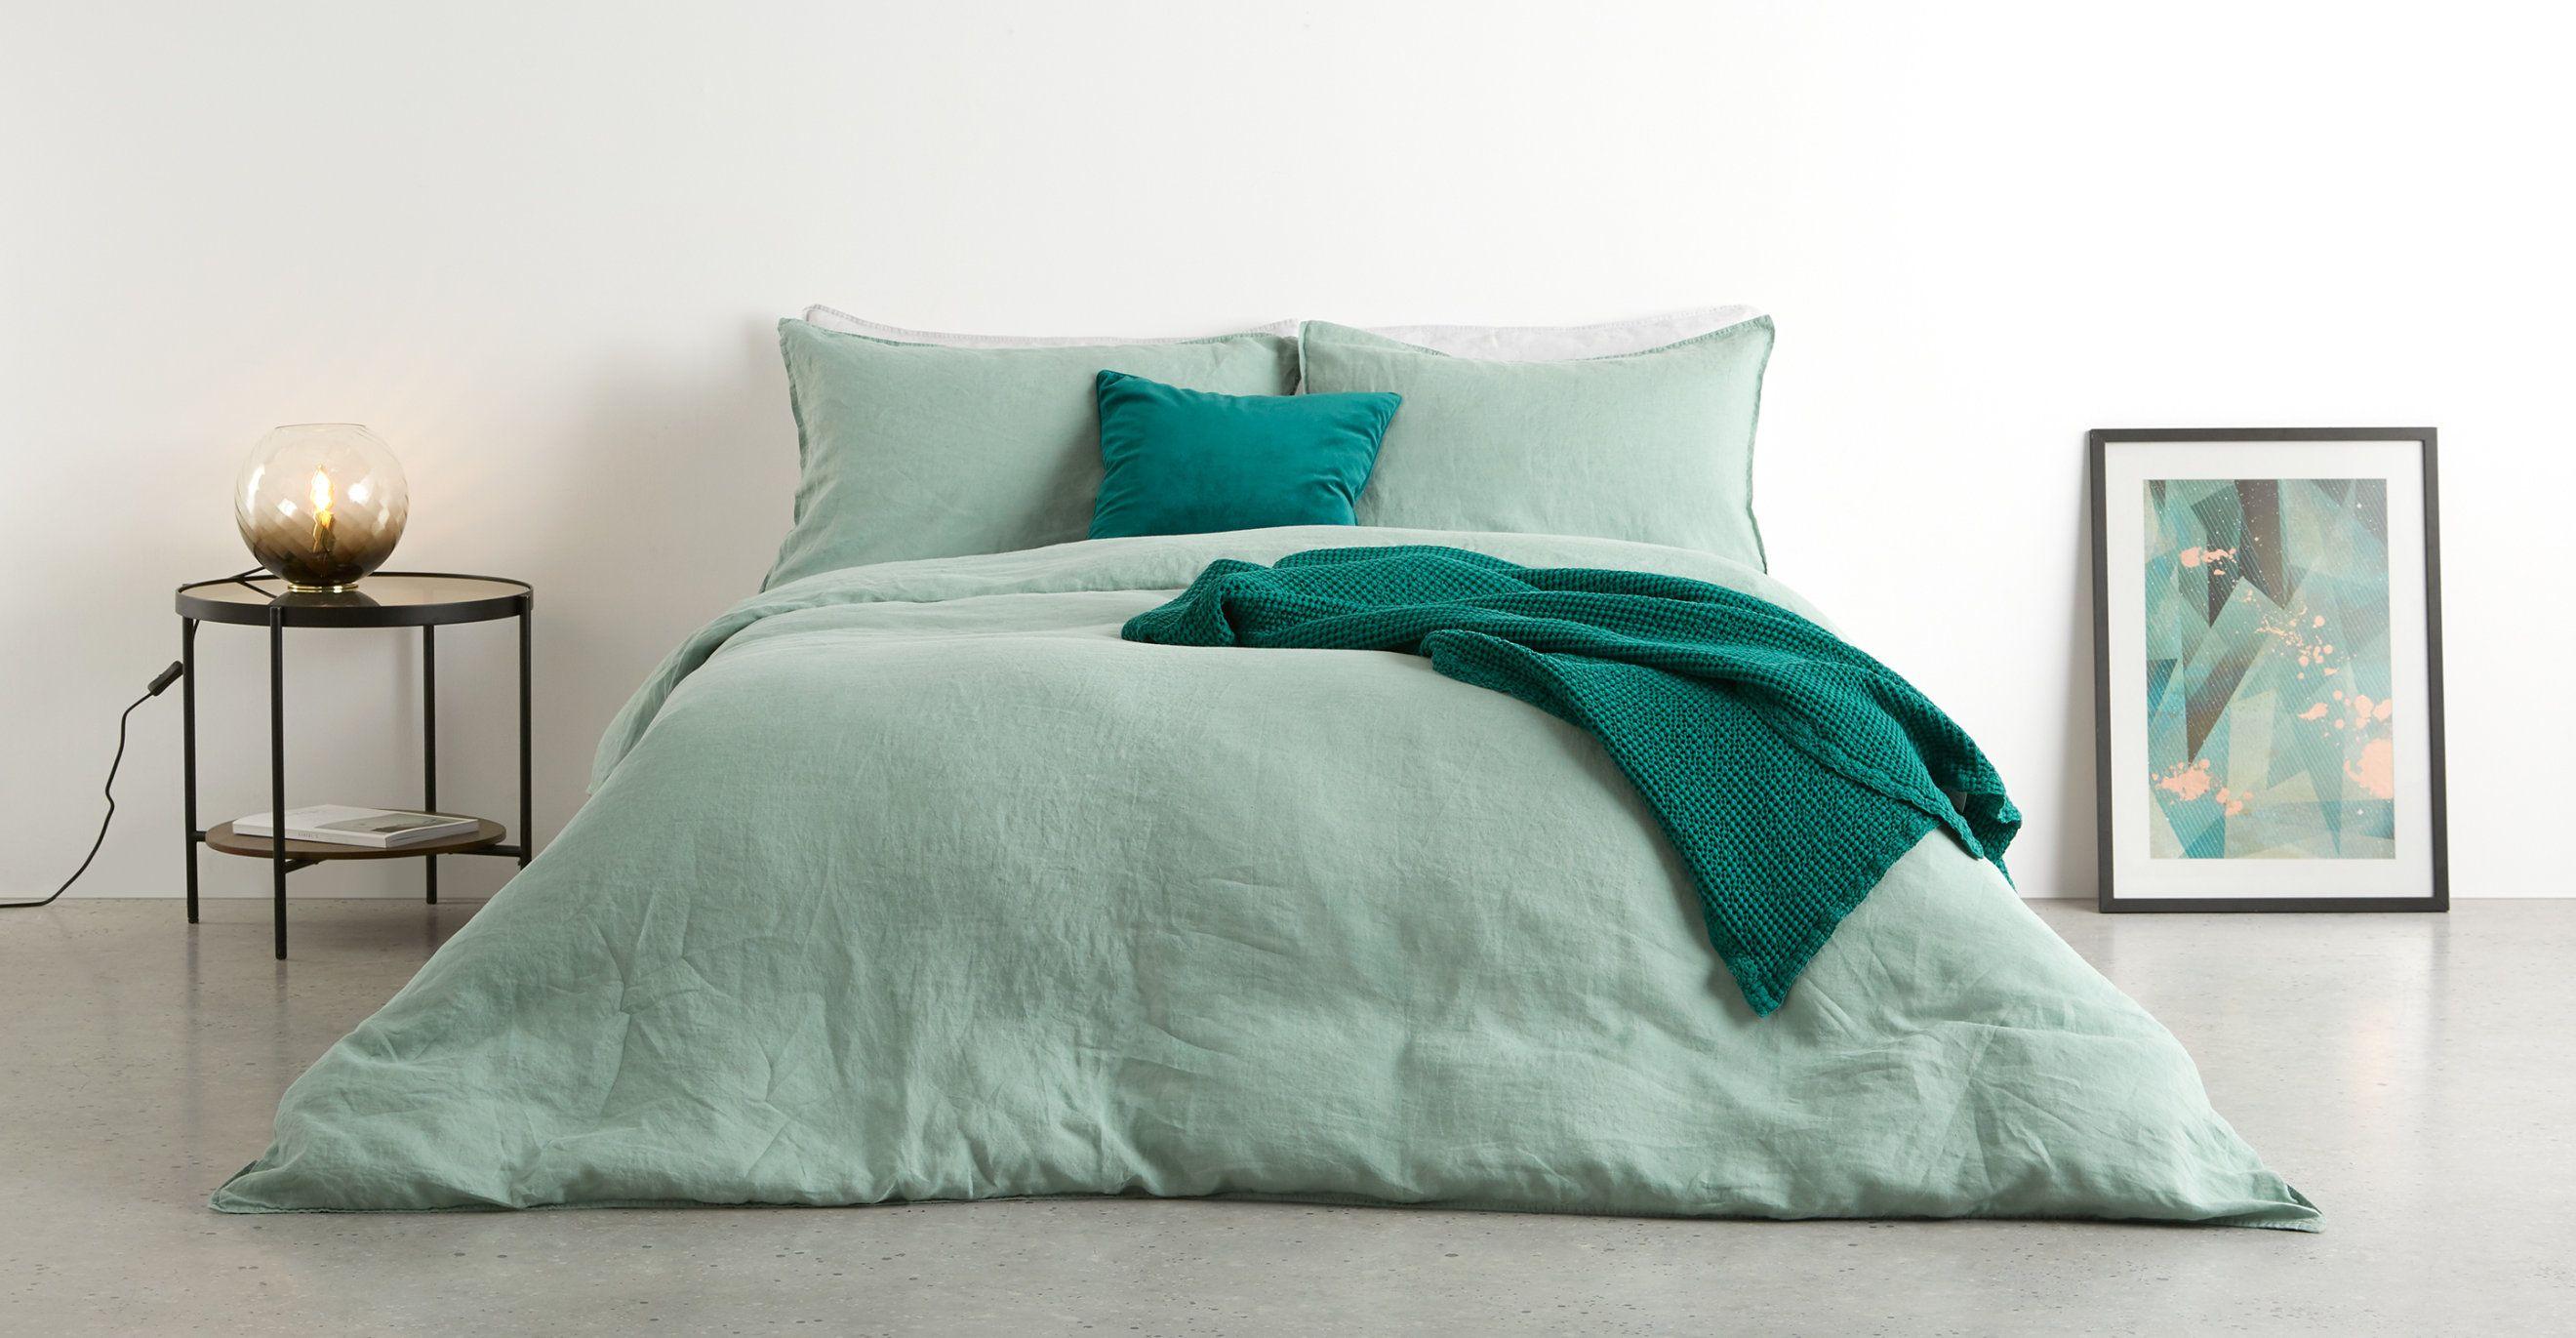 Best Linen Bedding 11 Of The